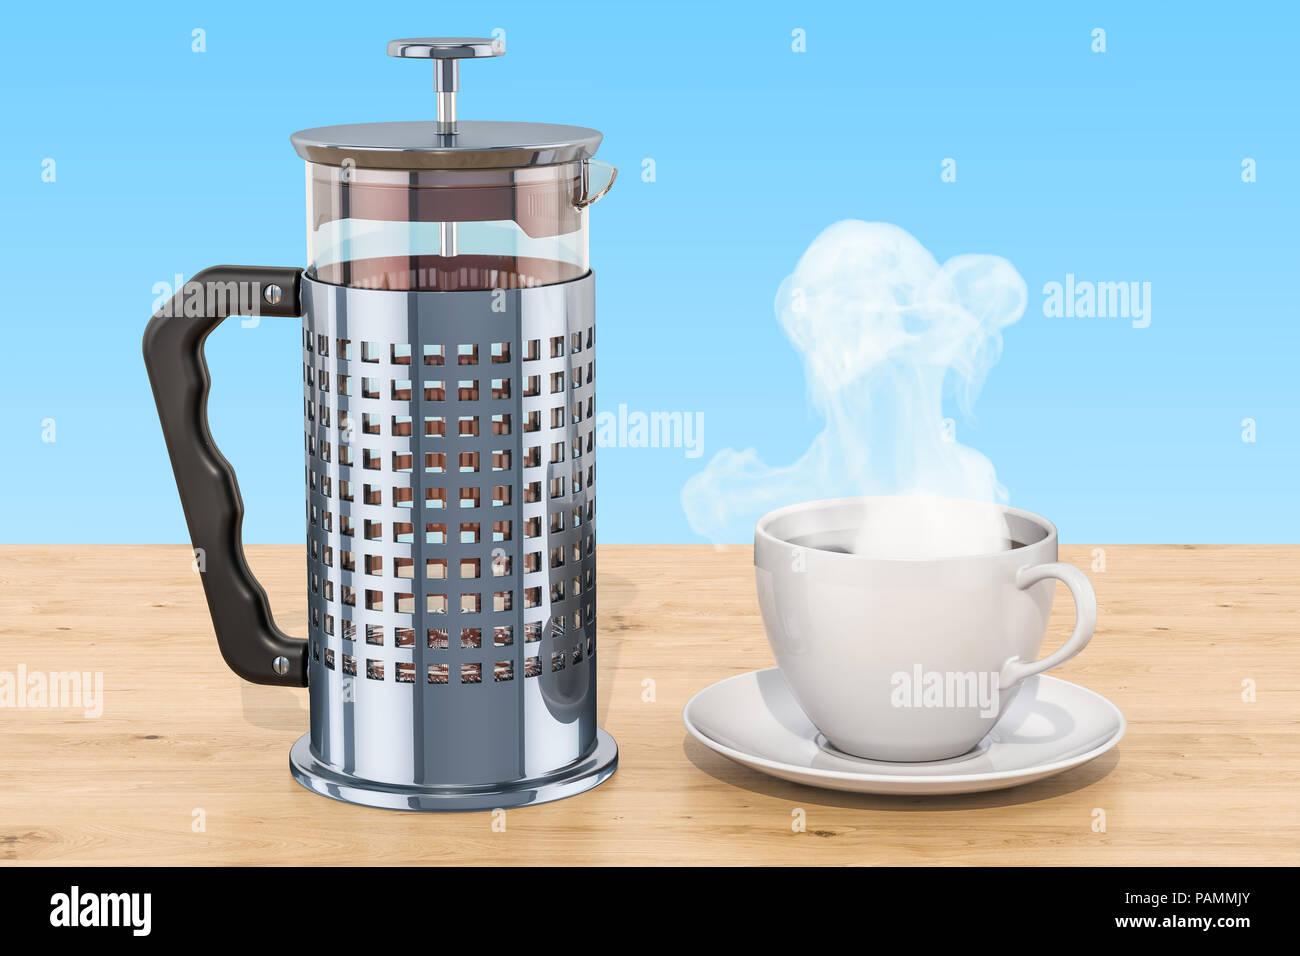 Illustration French Coffee Press Stock Photos & Illustration French ...